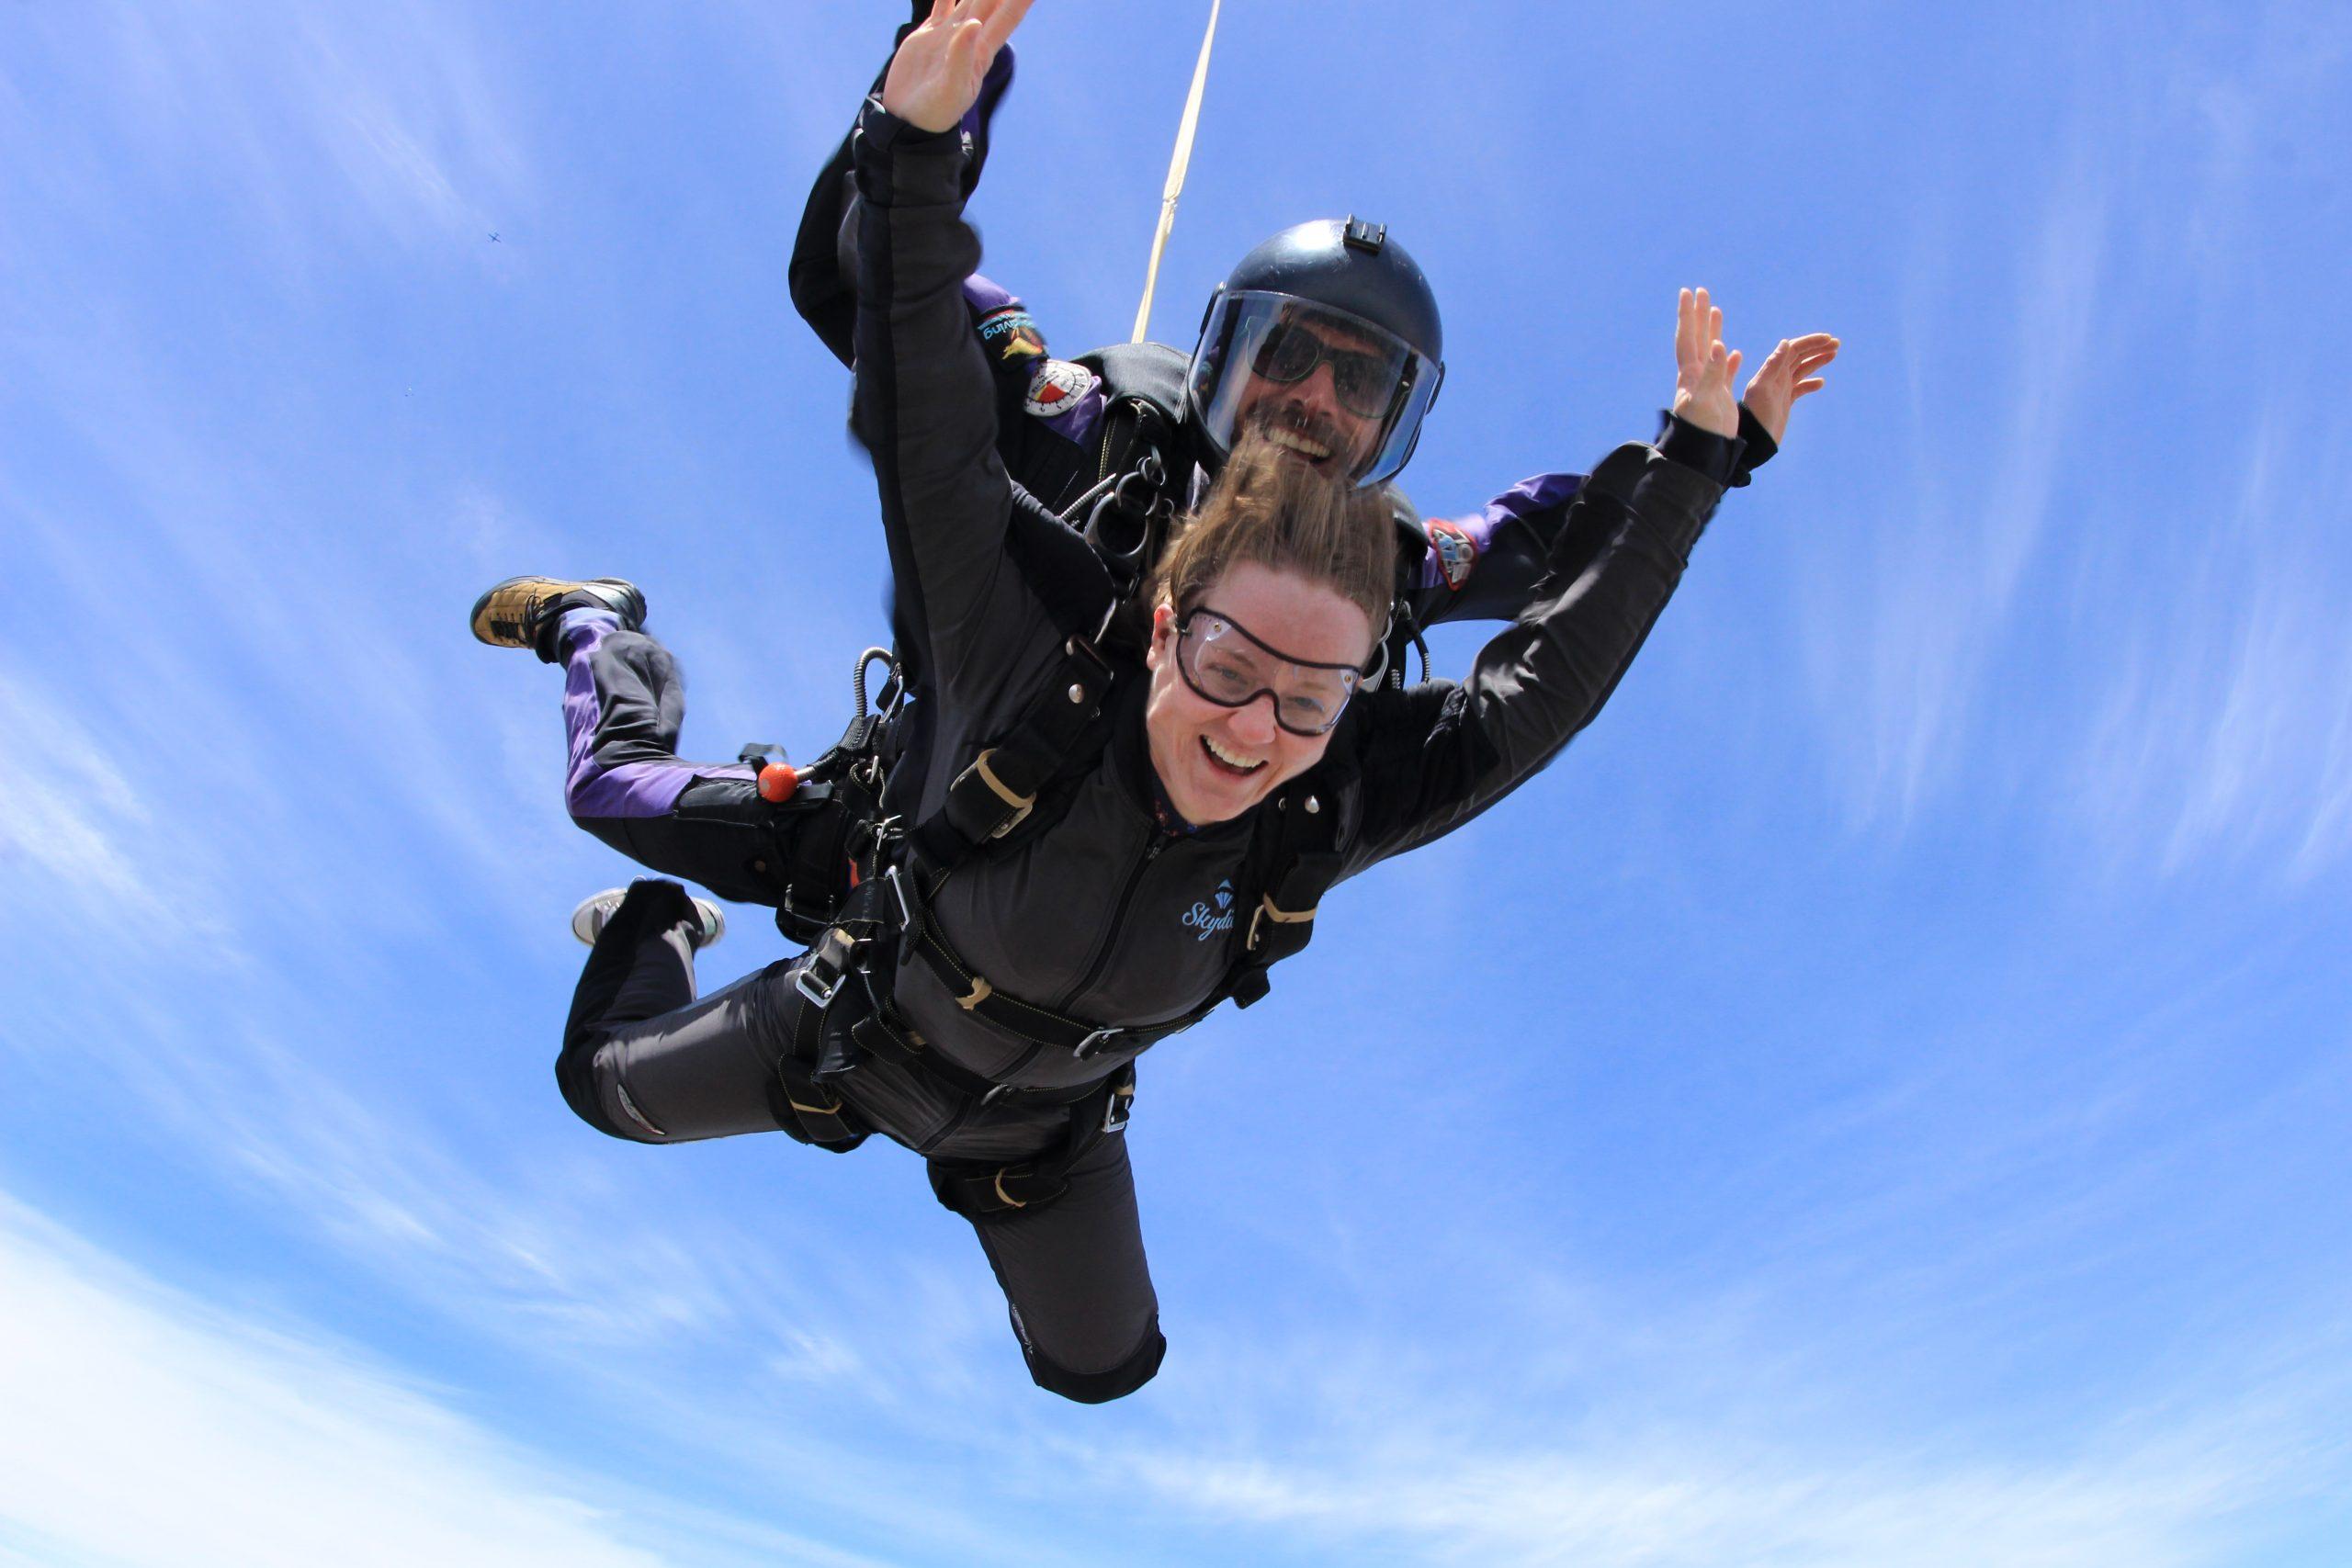 skydiving outfit tandem skydiving northern california skydive california